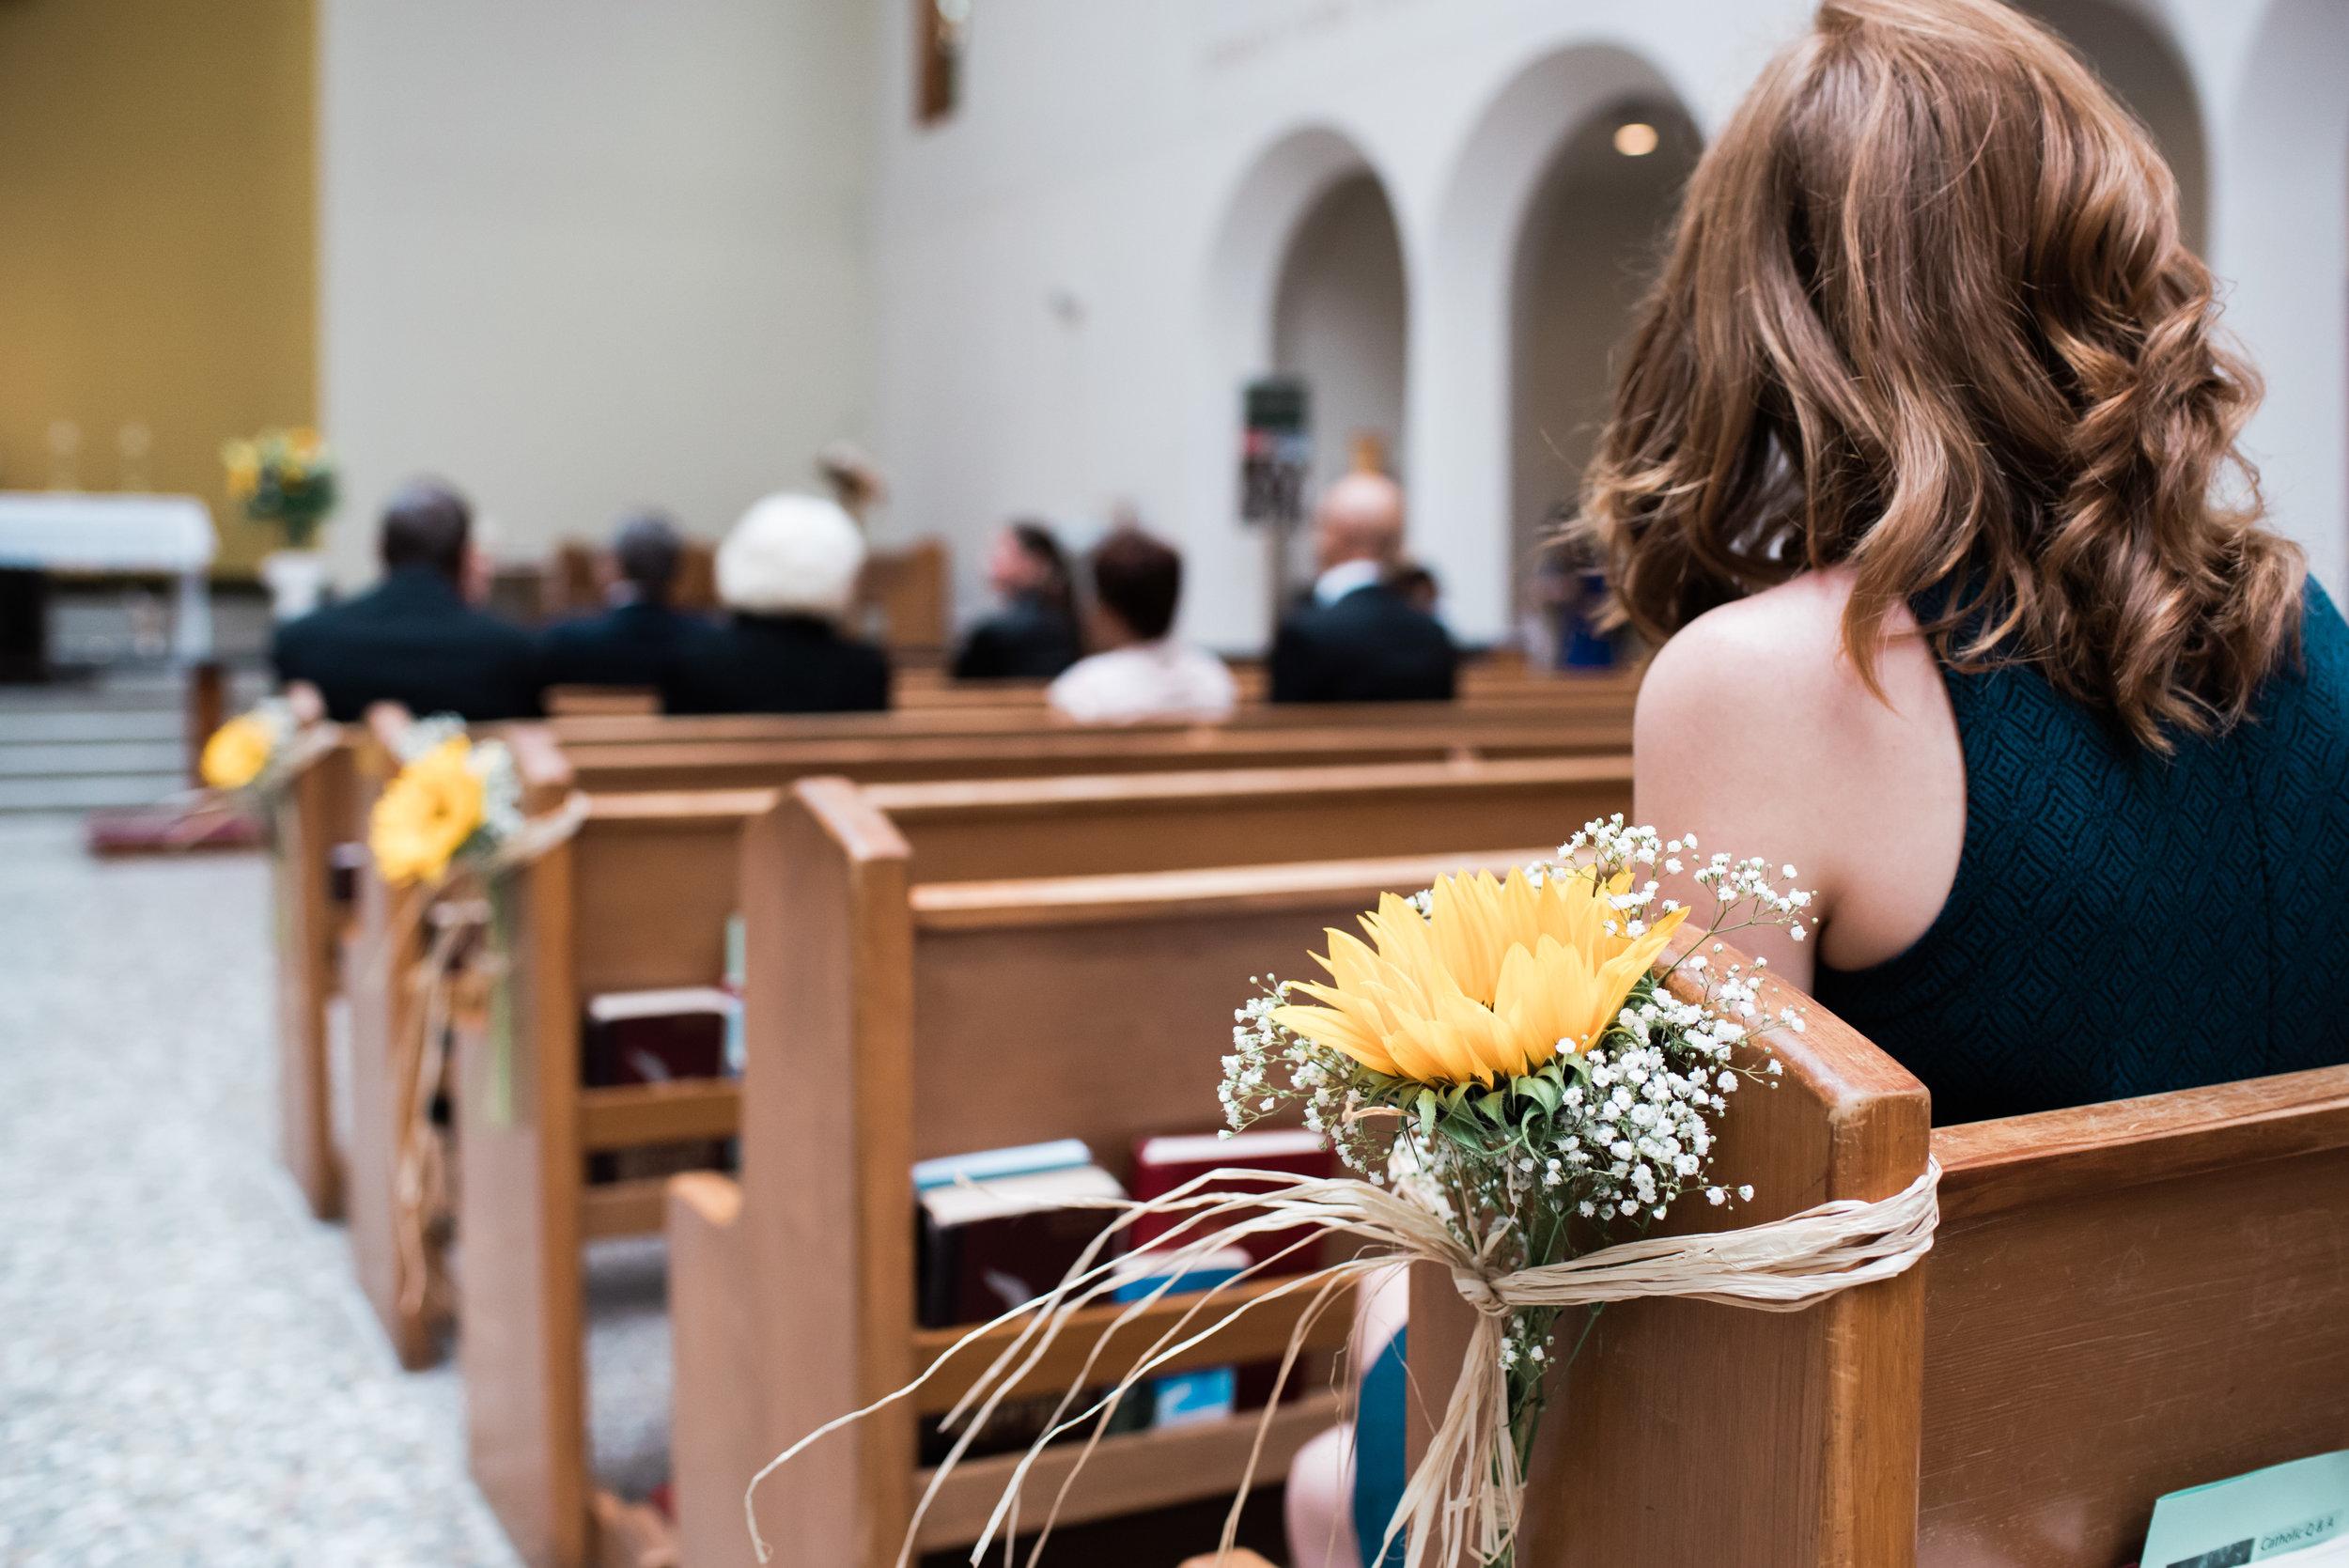 Amanda-rene-wedding-0320-jelger-tanja-photographers.jpg